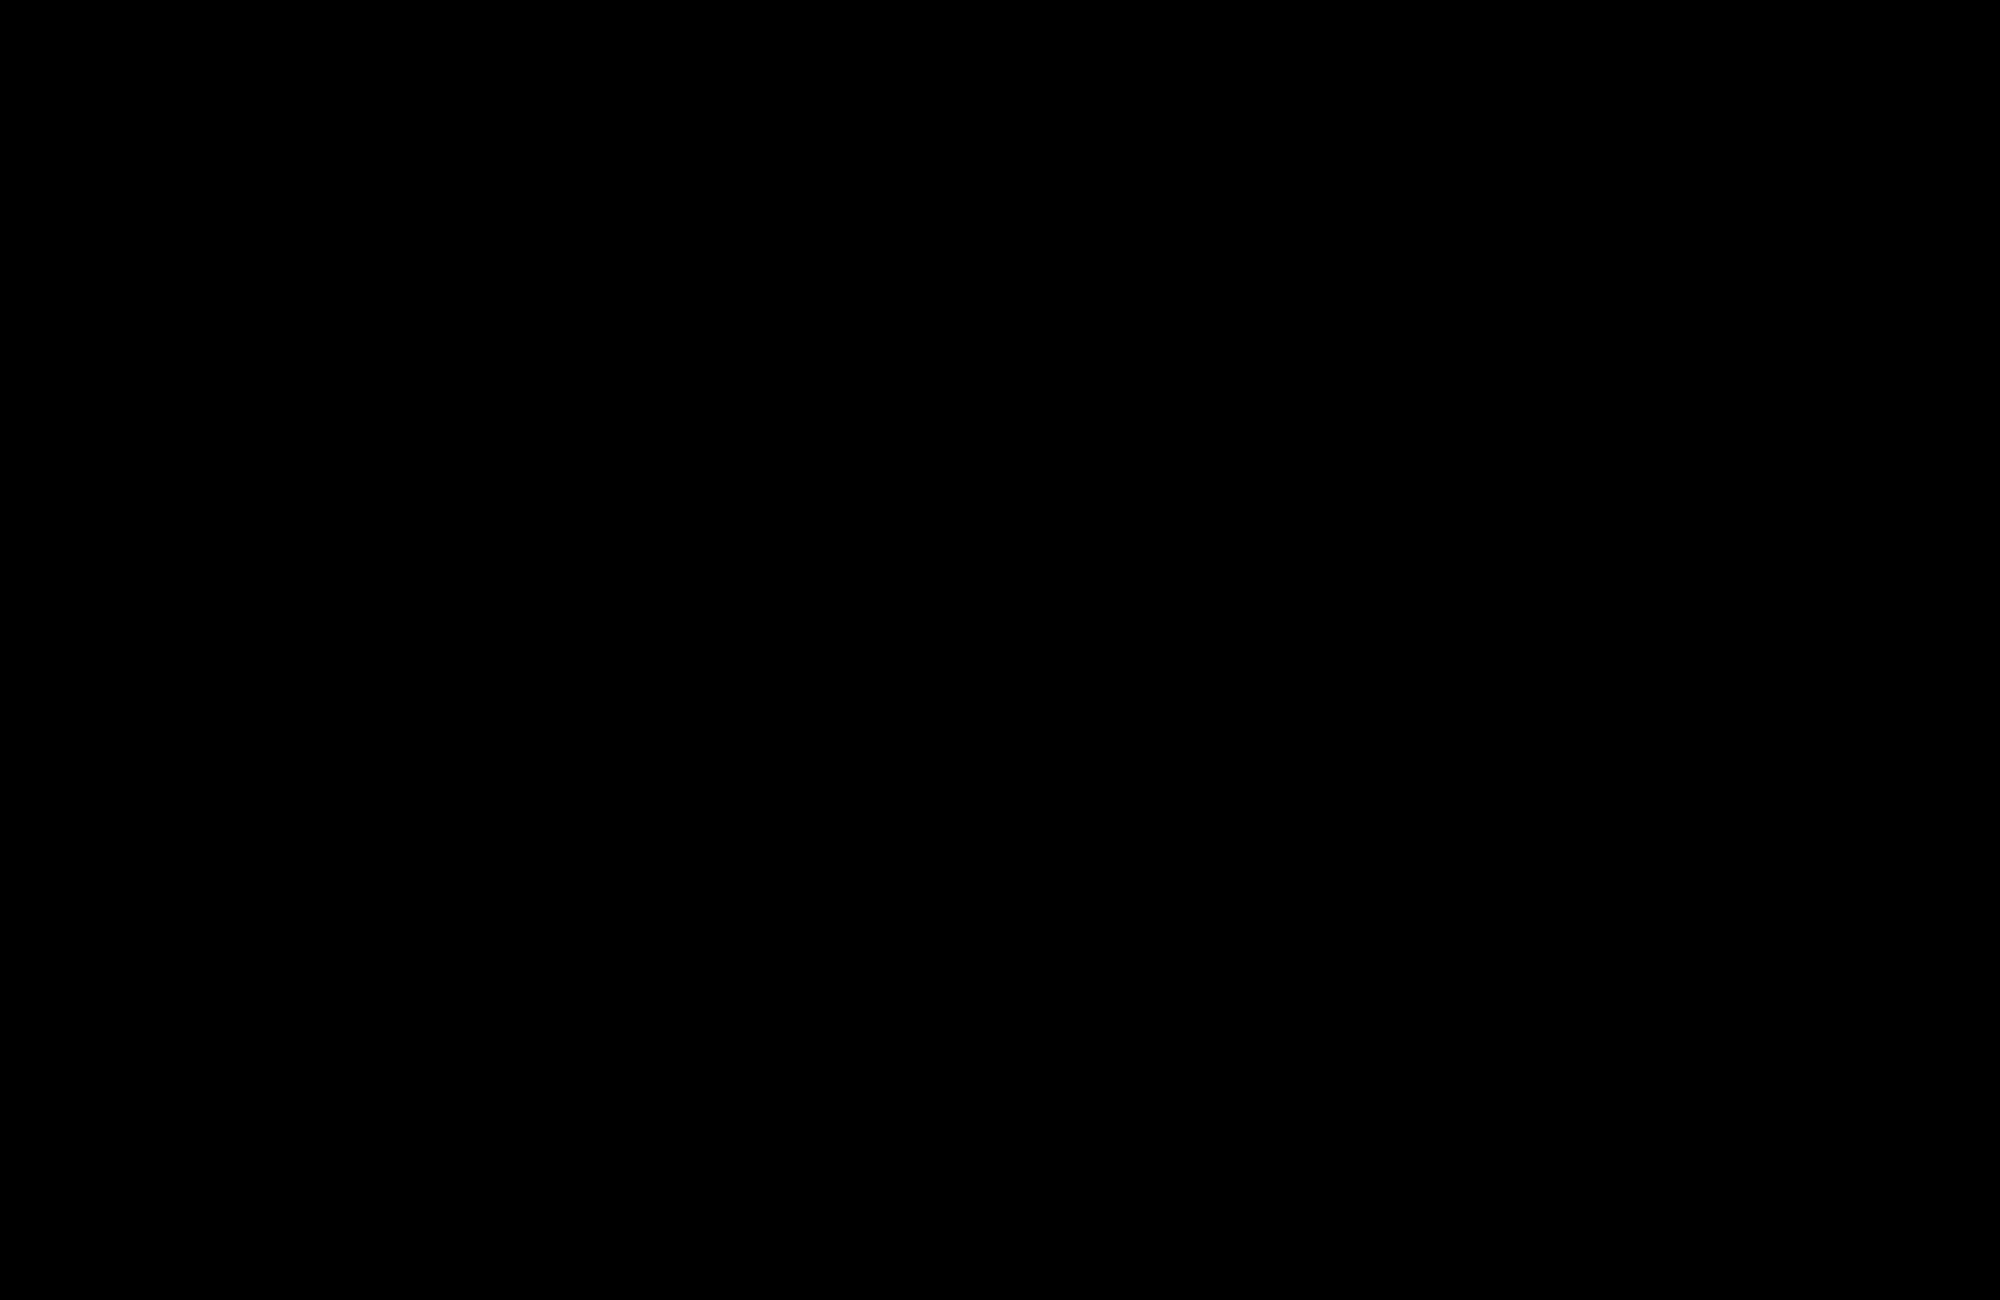 EXM10SN Neodymium Series Midrange Frequency Response